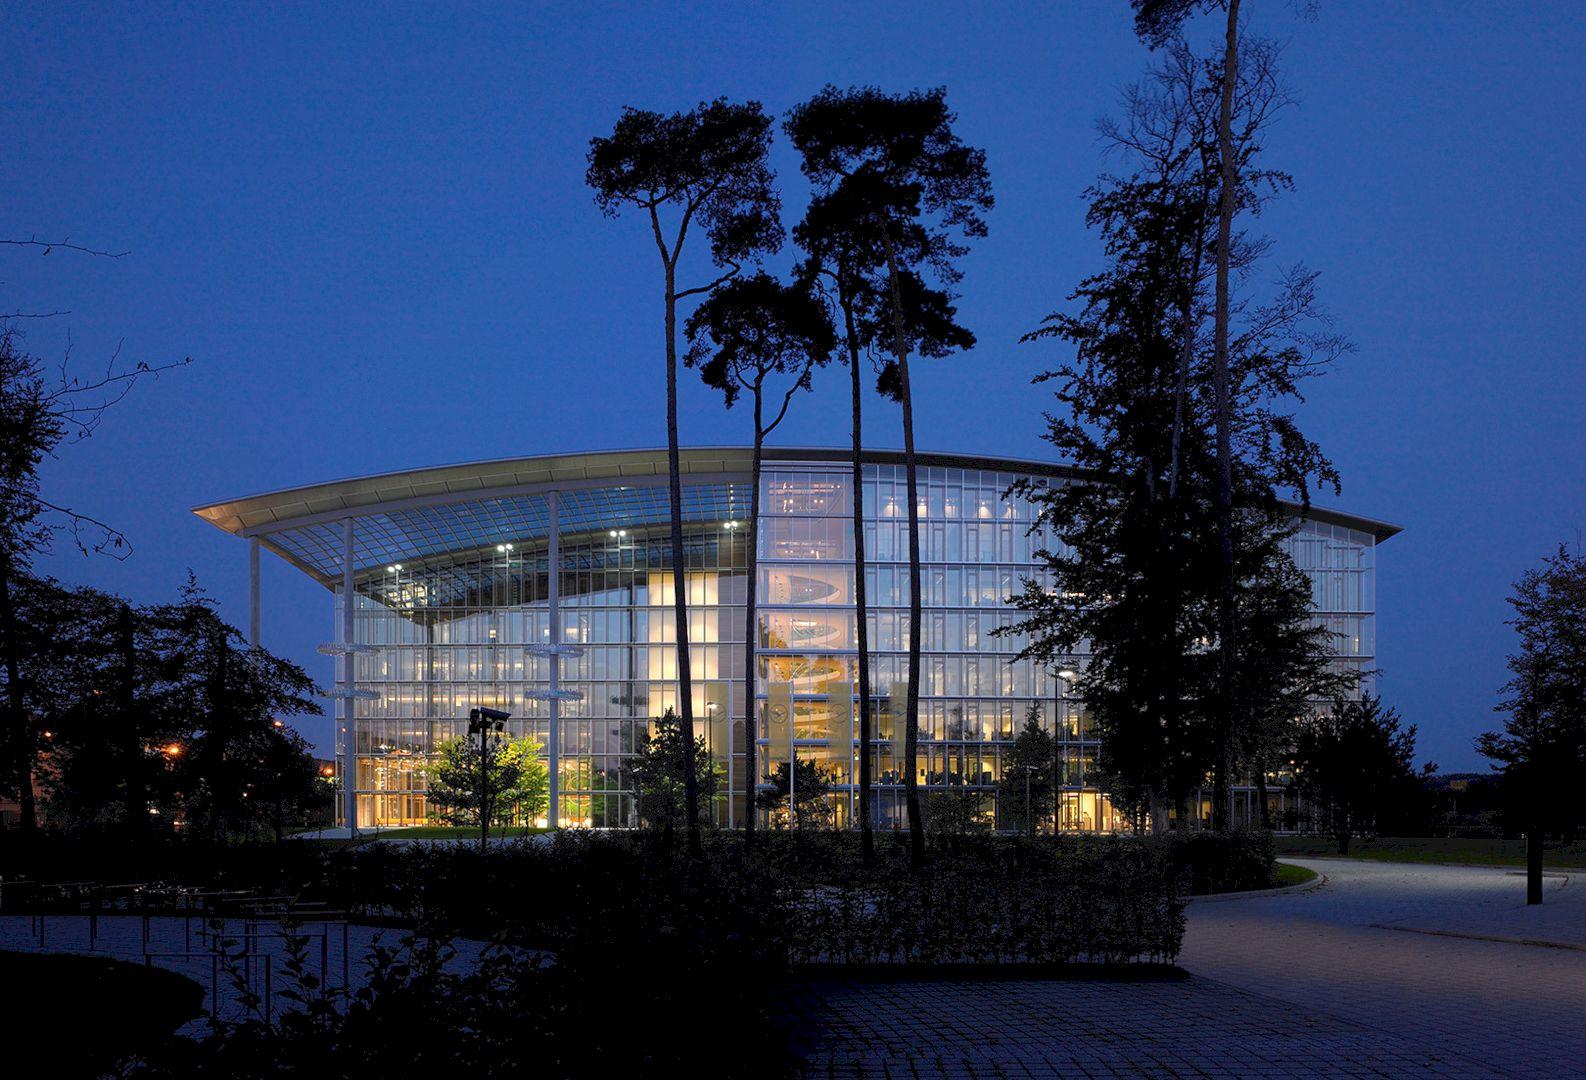 Lufthansa Aviation Center Frankfurt By Ingenhoven Architects 2